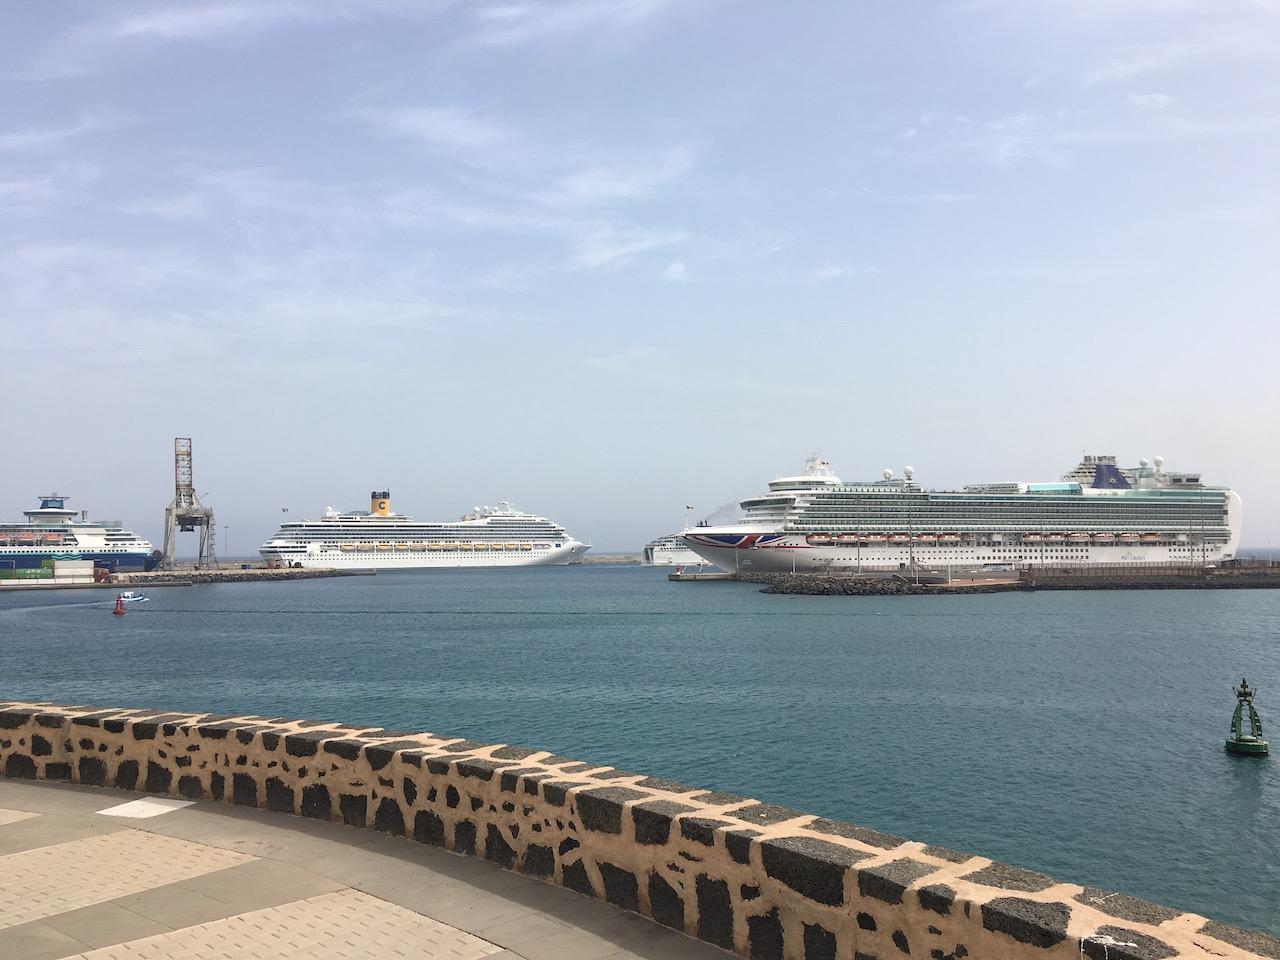 P&O Cruises Ventura in Lanzarote